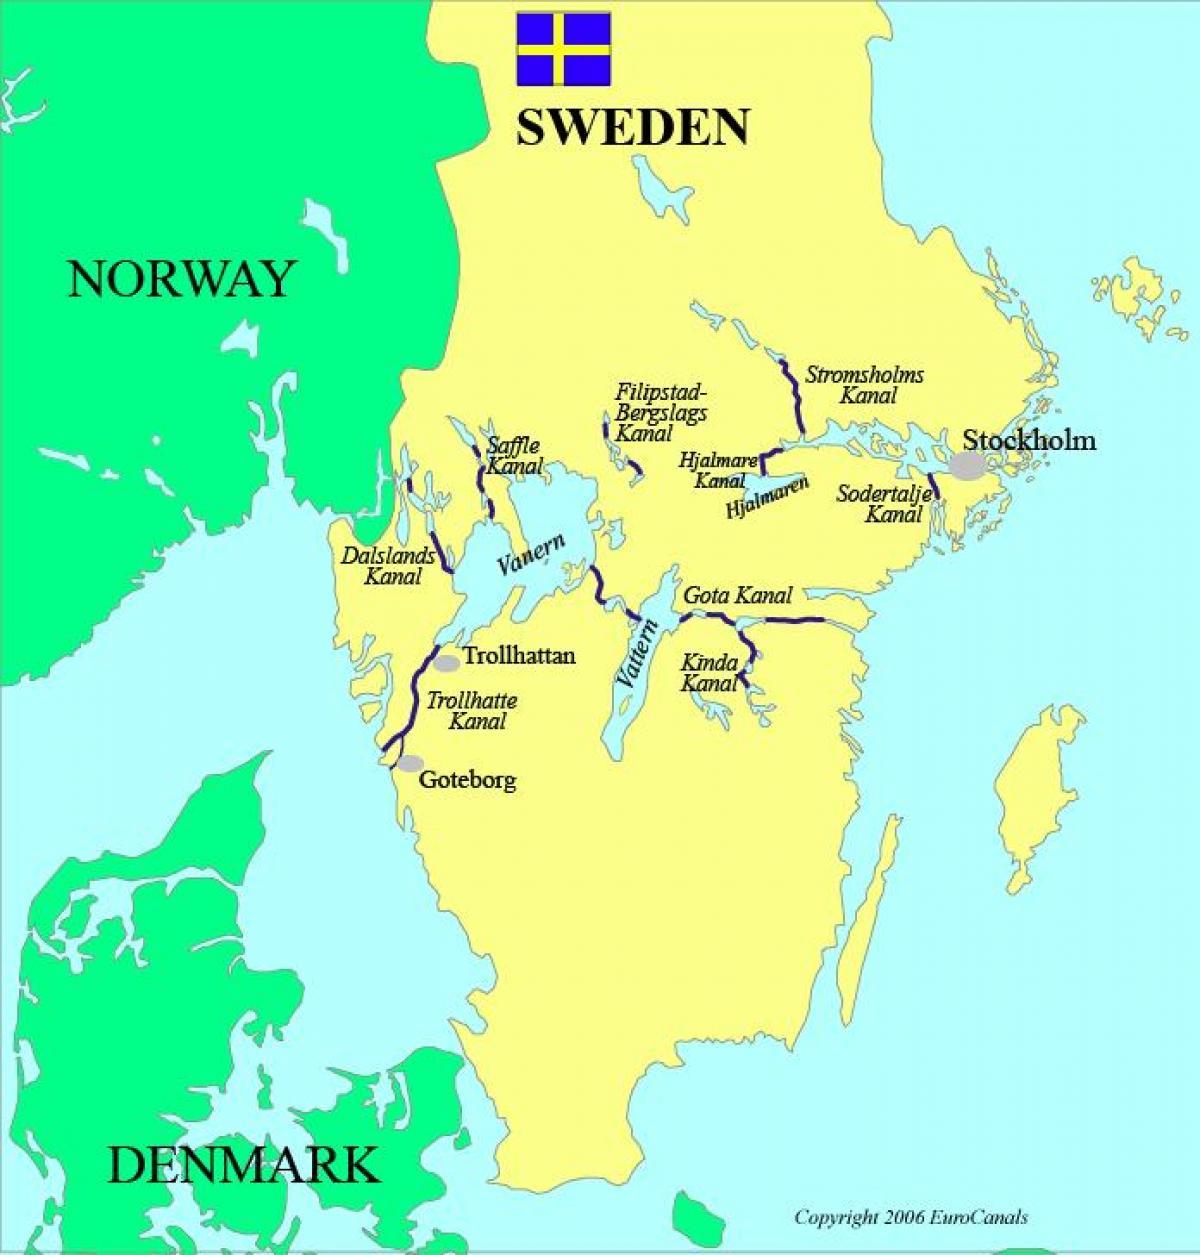 Karta Europa Pa Svenska.Svenska Kanalerna Karta Karta Over Svenska Kanalerna Norra Europa